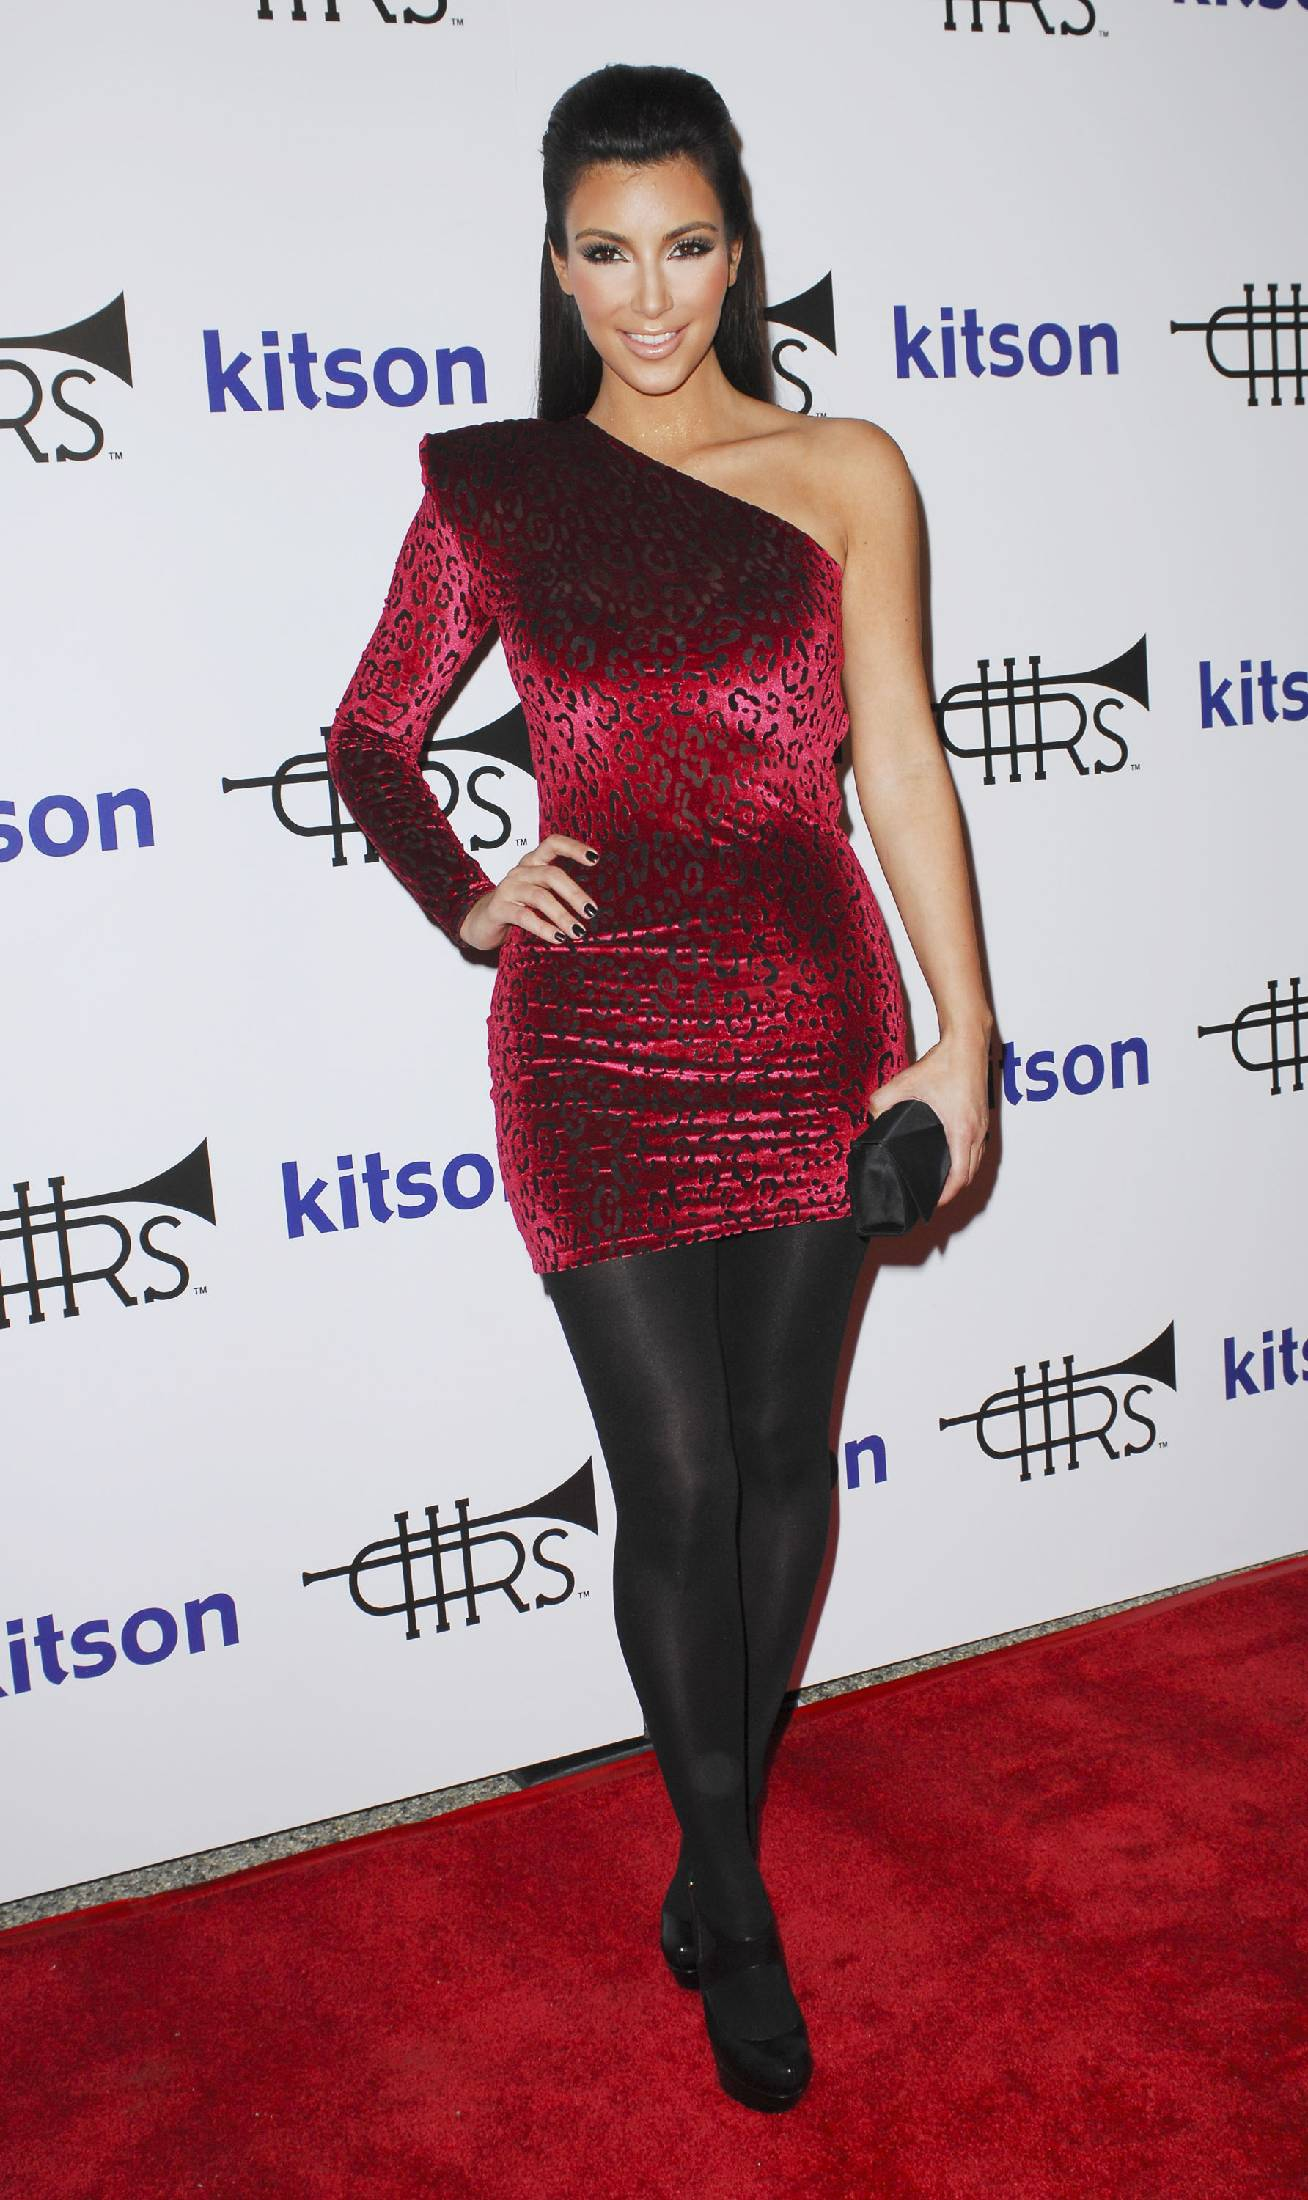 44985_Kim_Kardashian_06_122_153lo.jpg